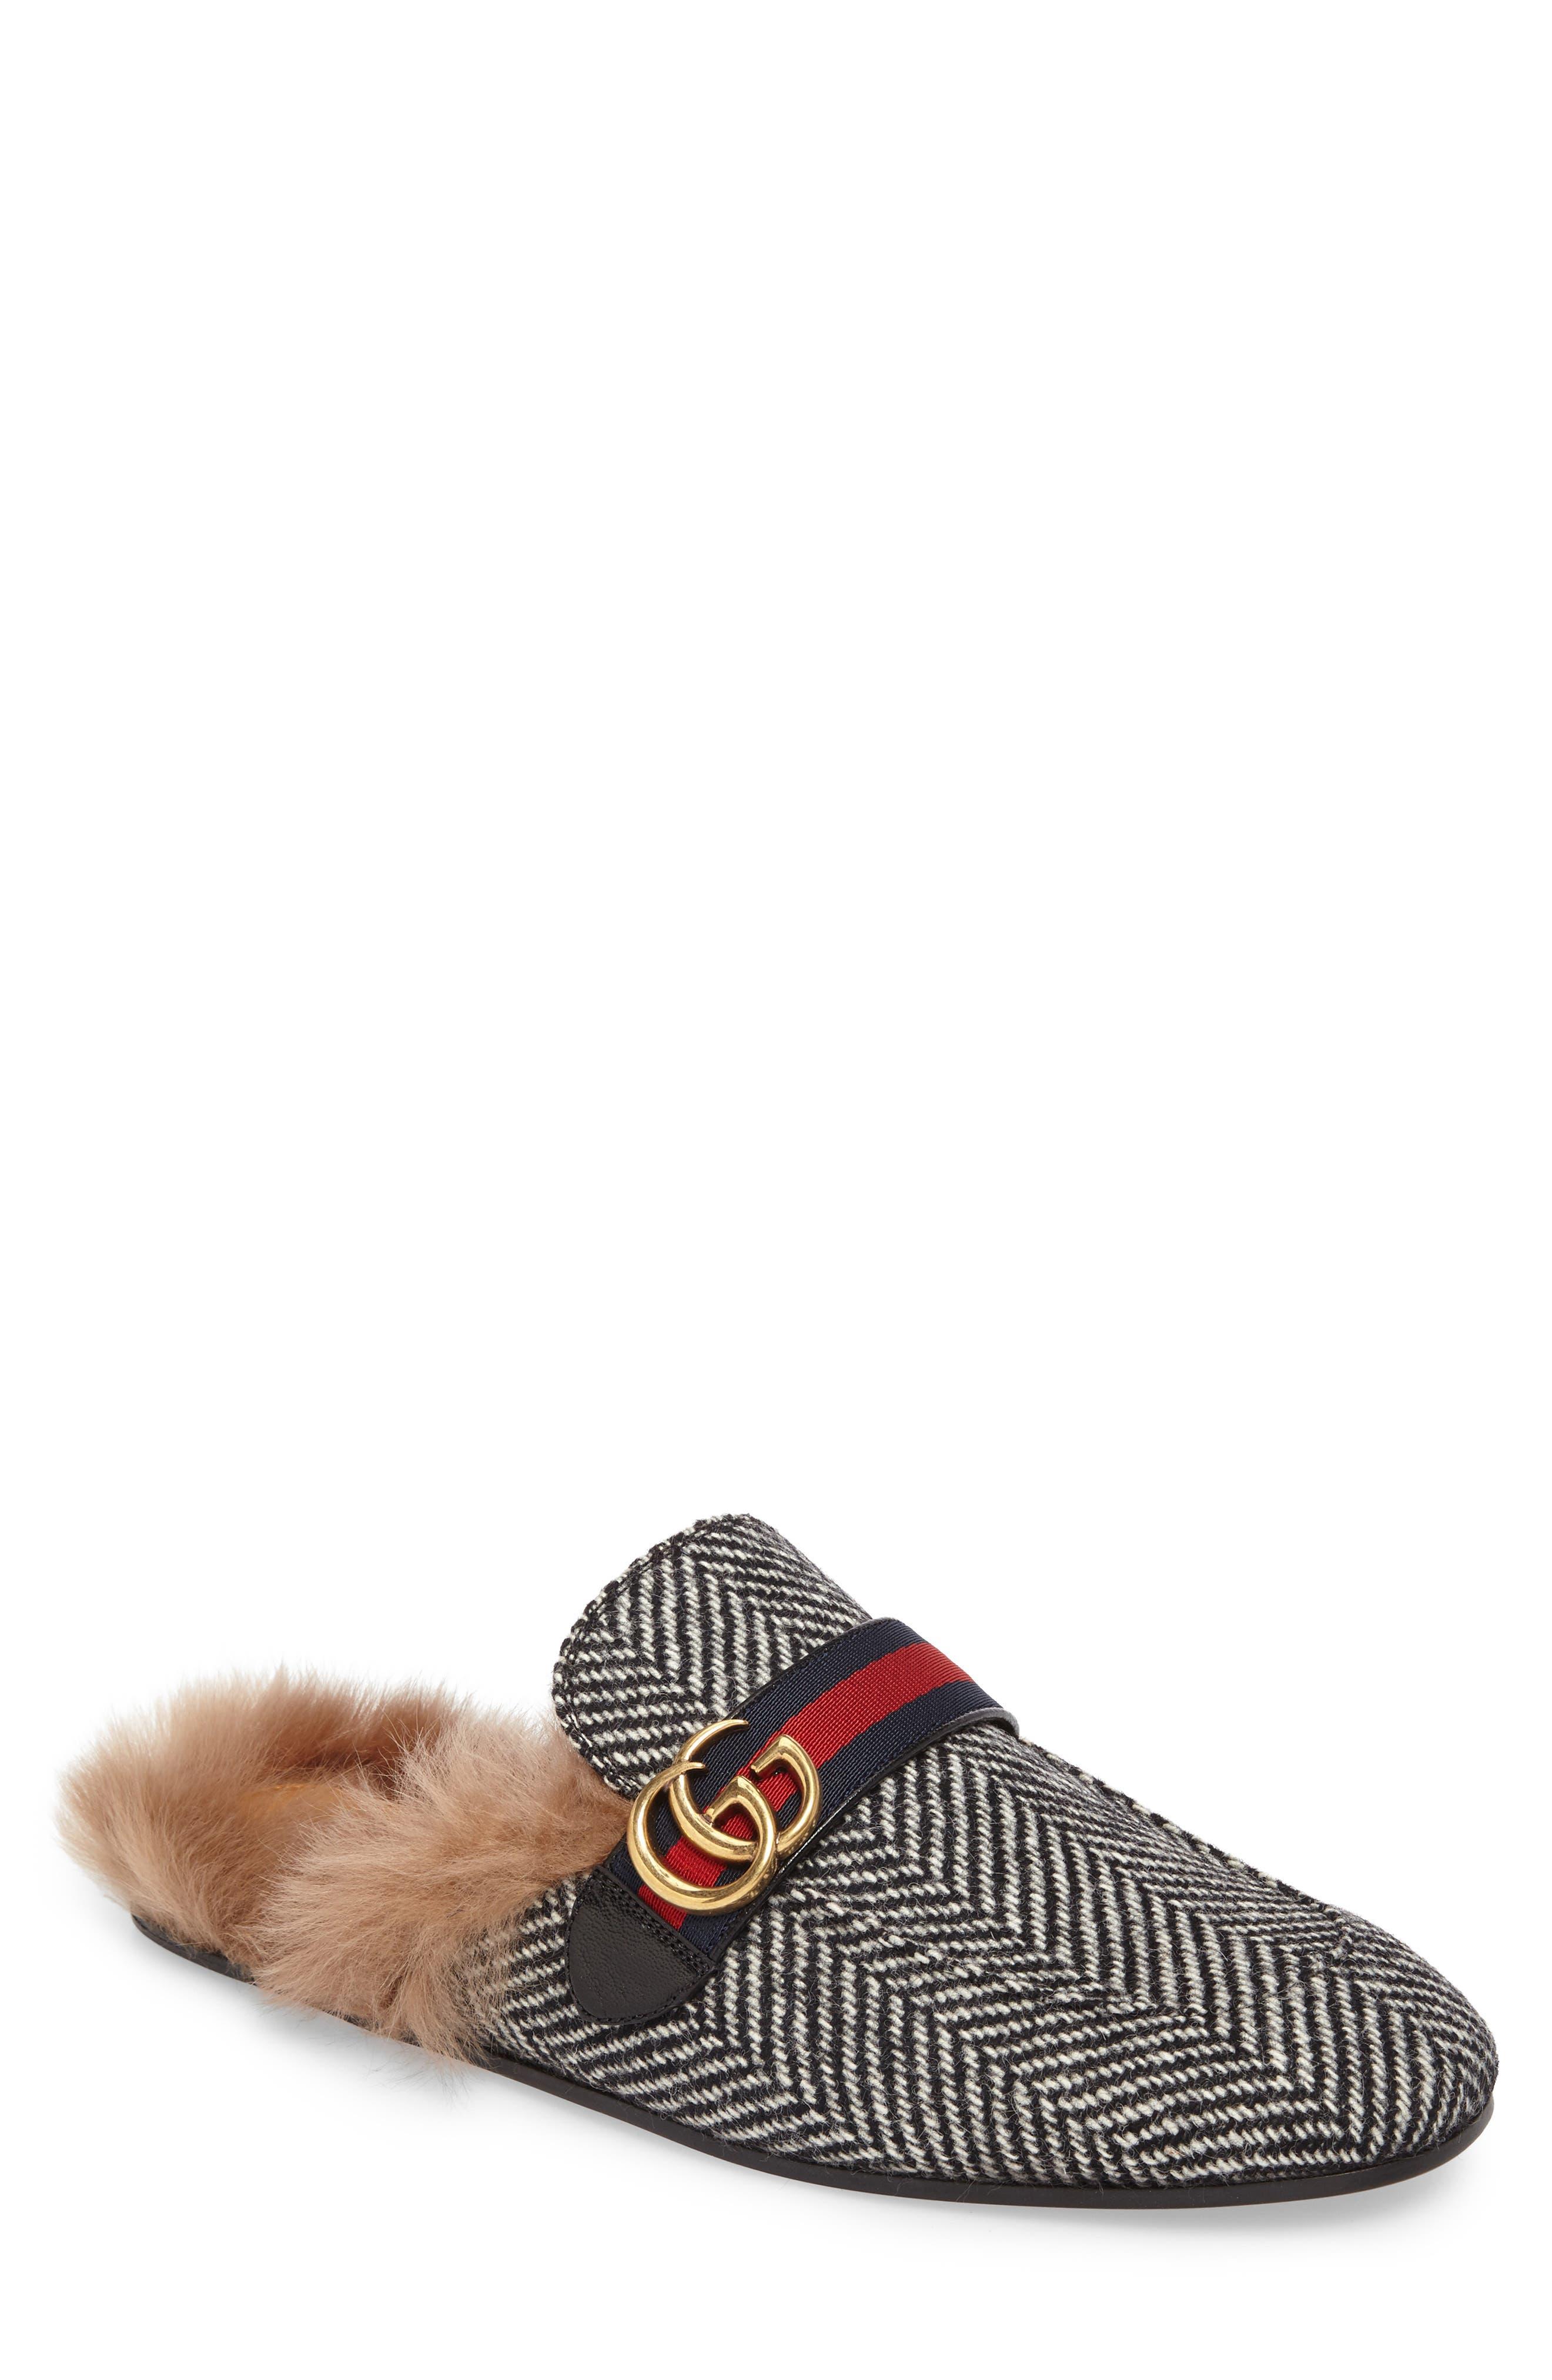 Main Image - Gucci New Princetown Genuine Shearling Herringbone Loafer Mule (Men)